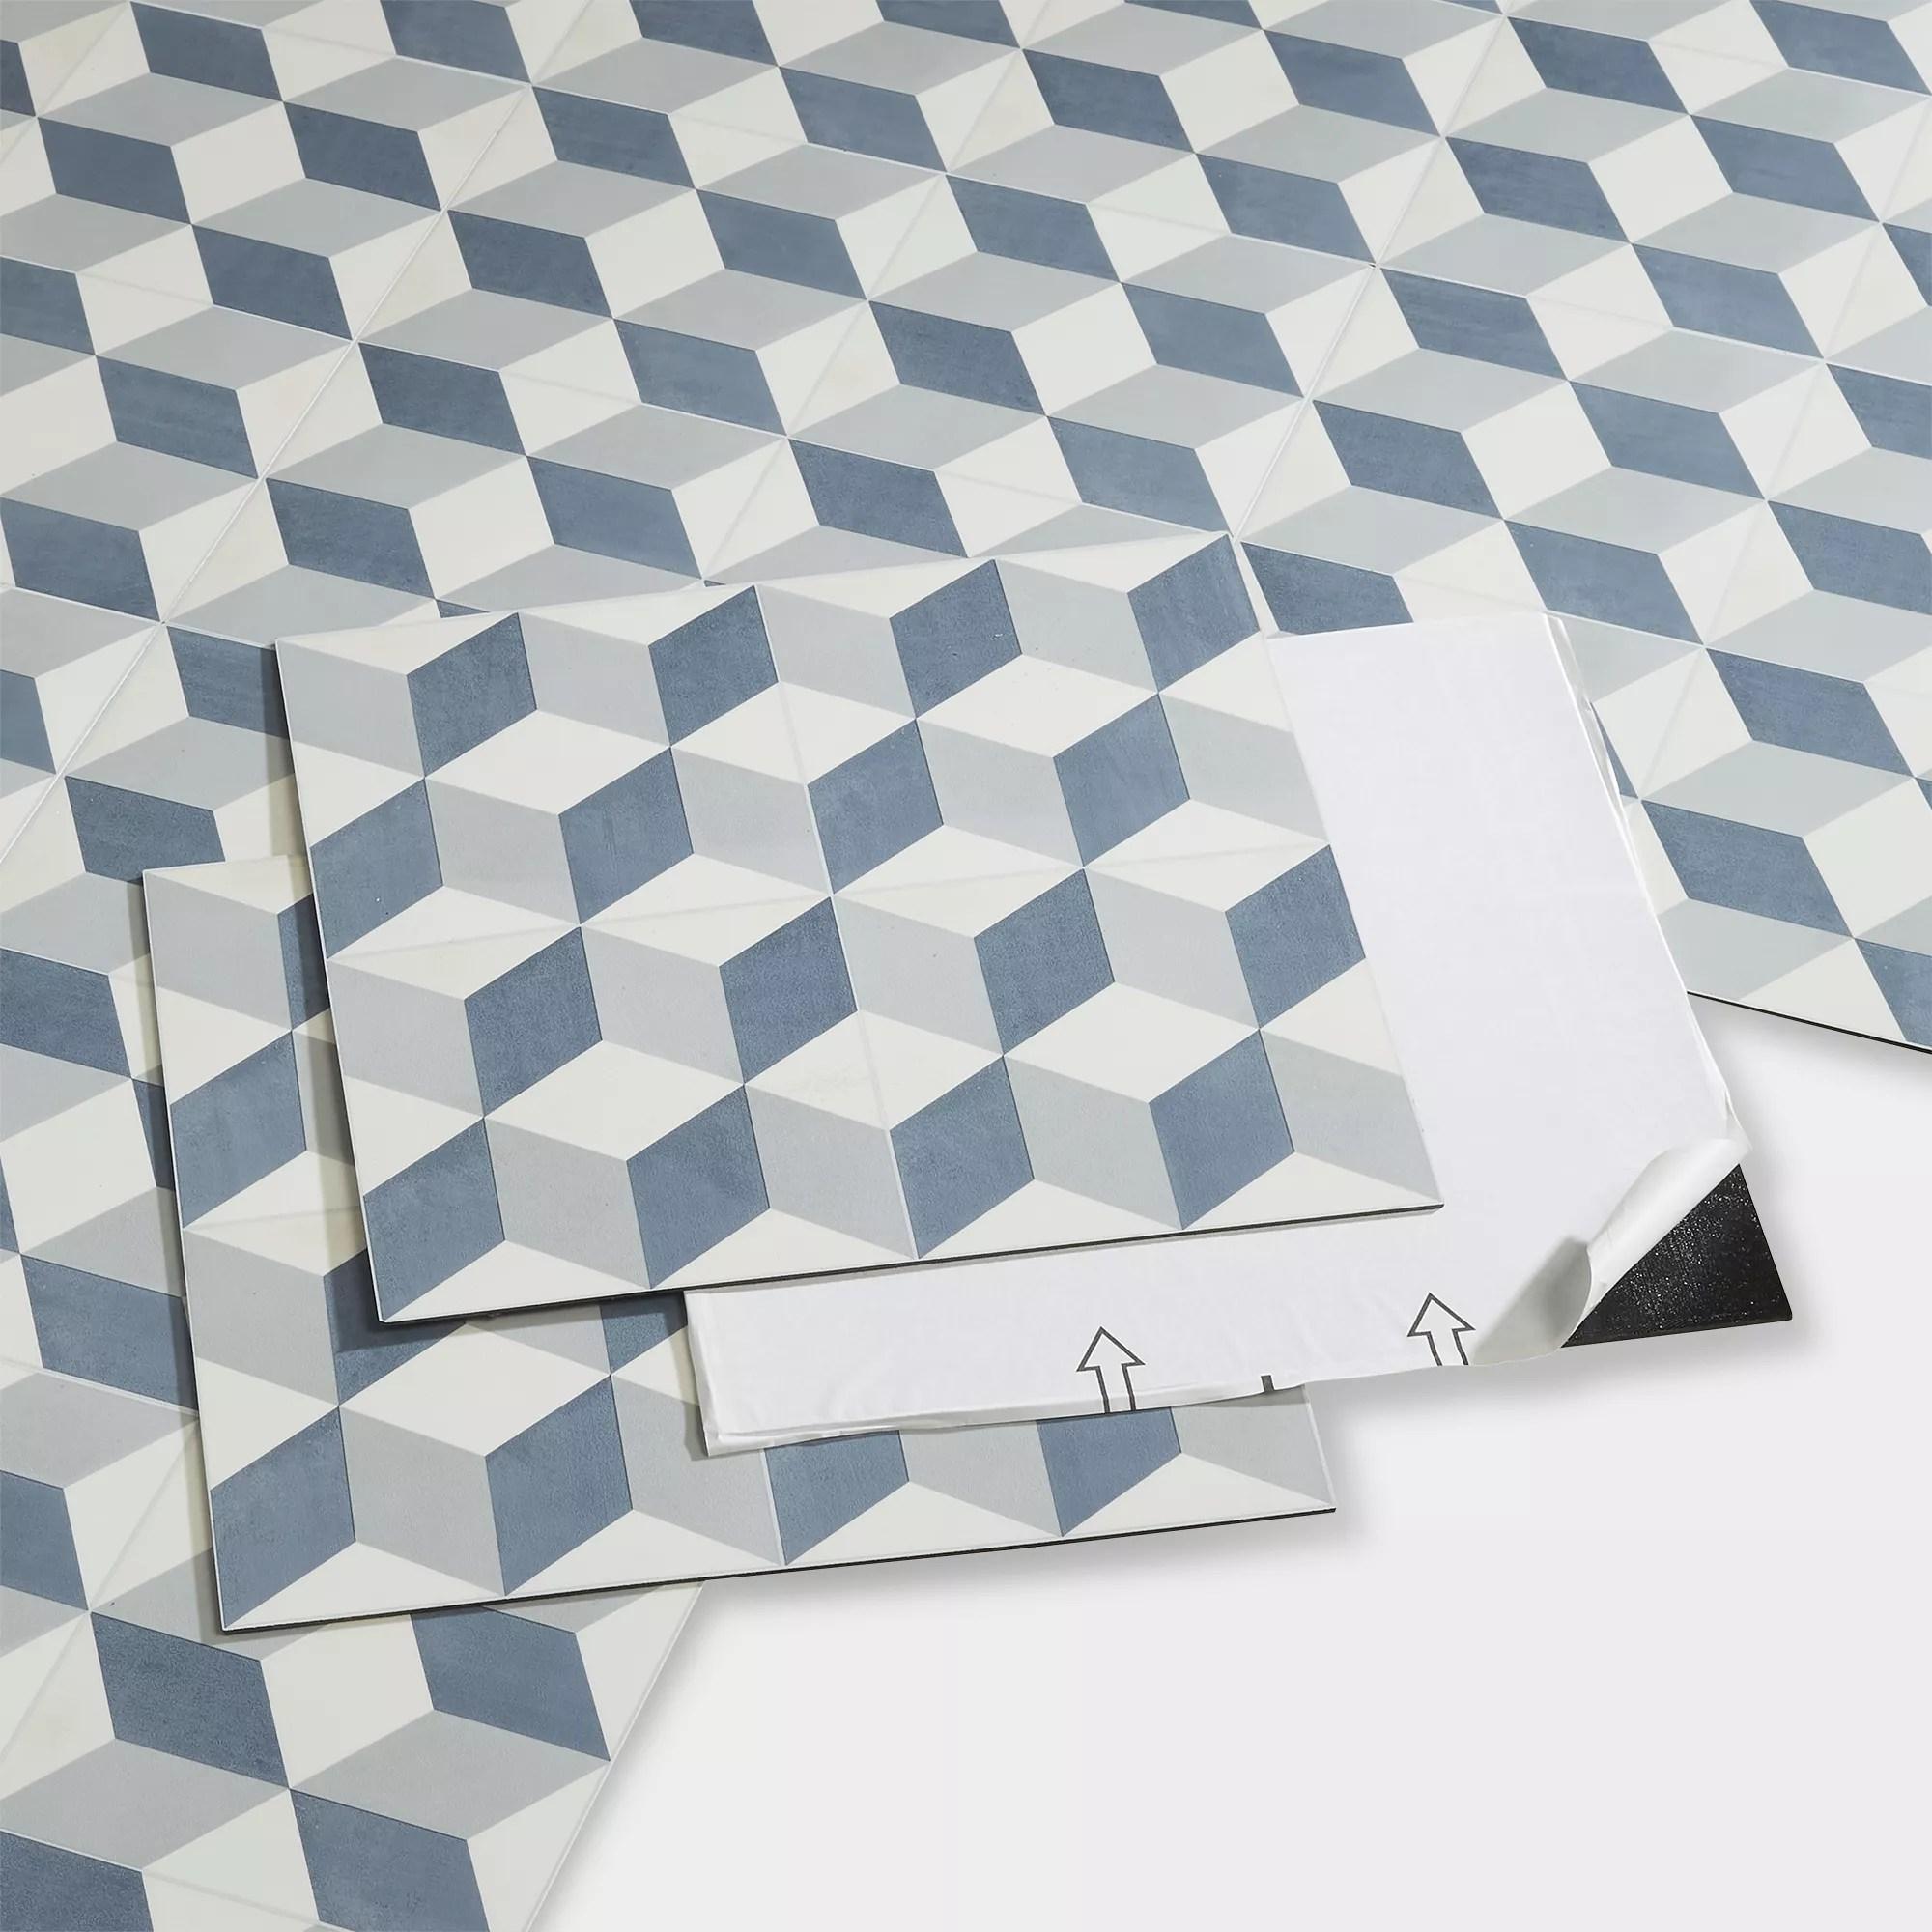 goodhome poprock blue geometric mosaic effect self adhesive vinyl tile pack of 14